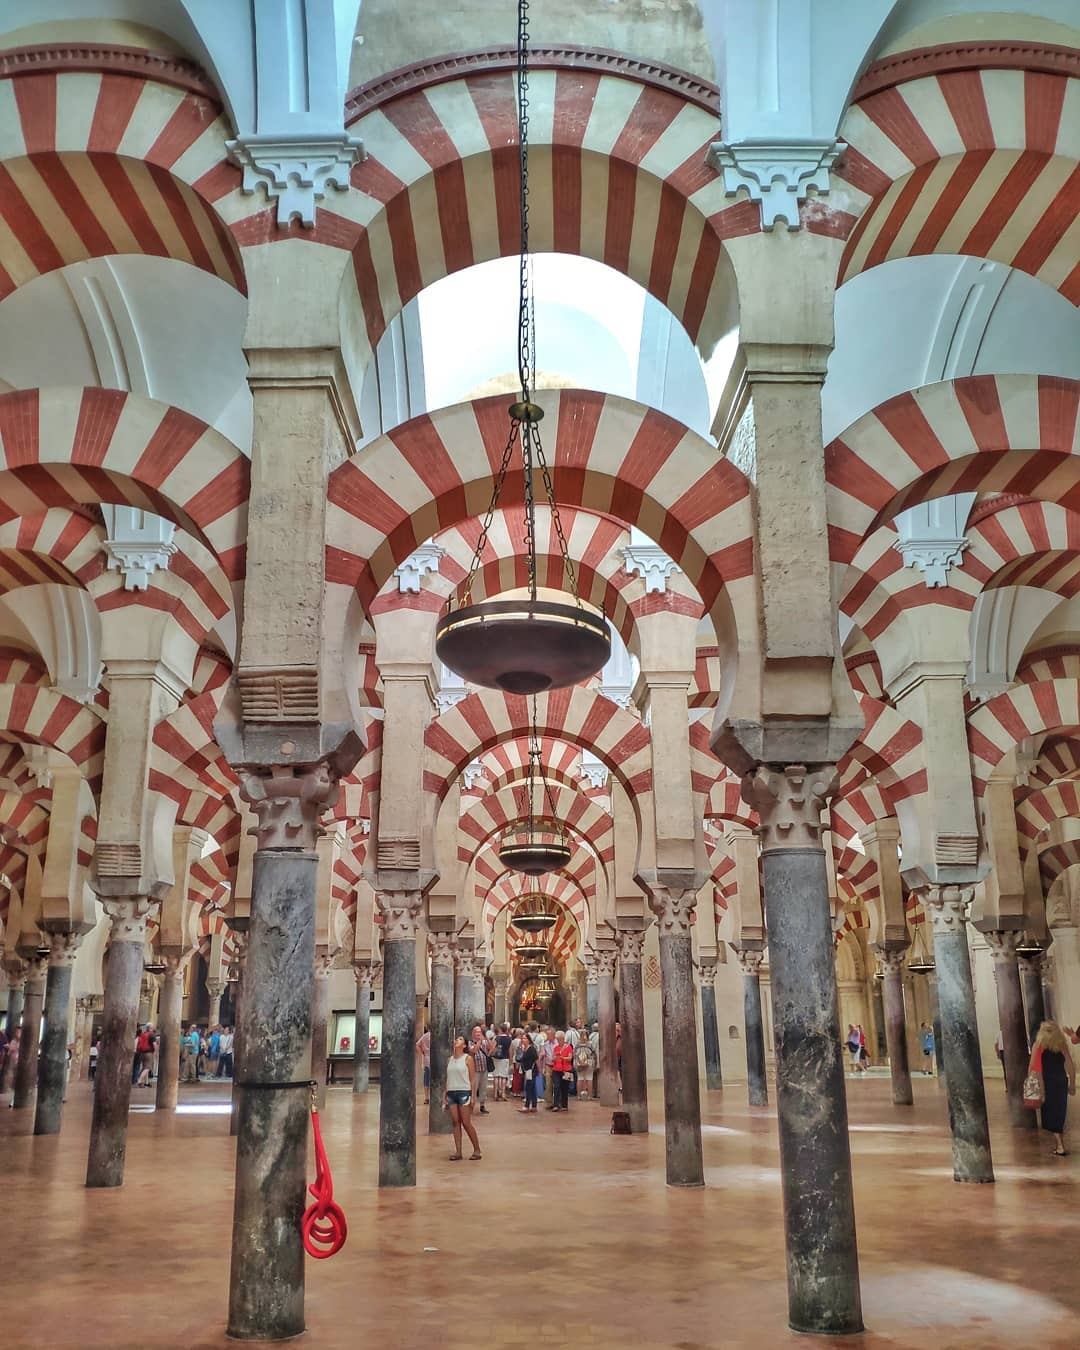 La Mezquita, Cordoba, Tây Ban Nha